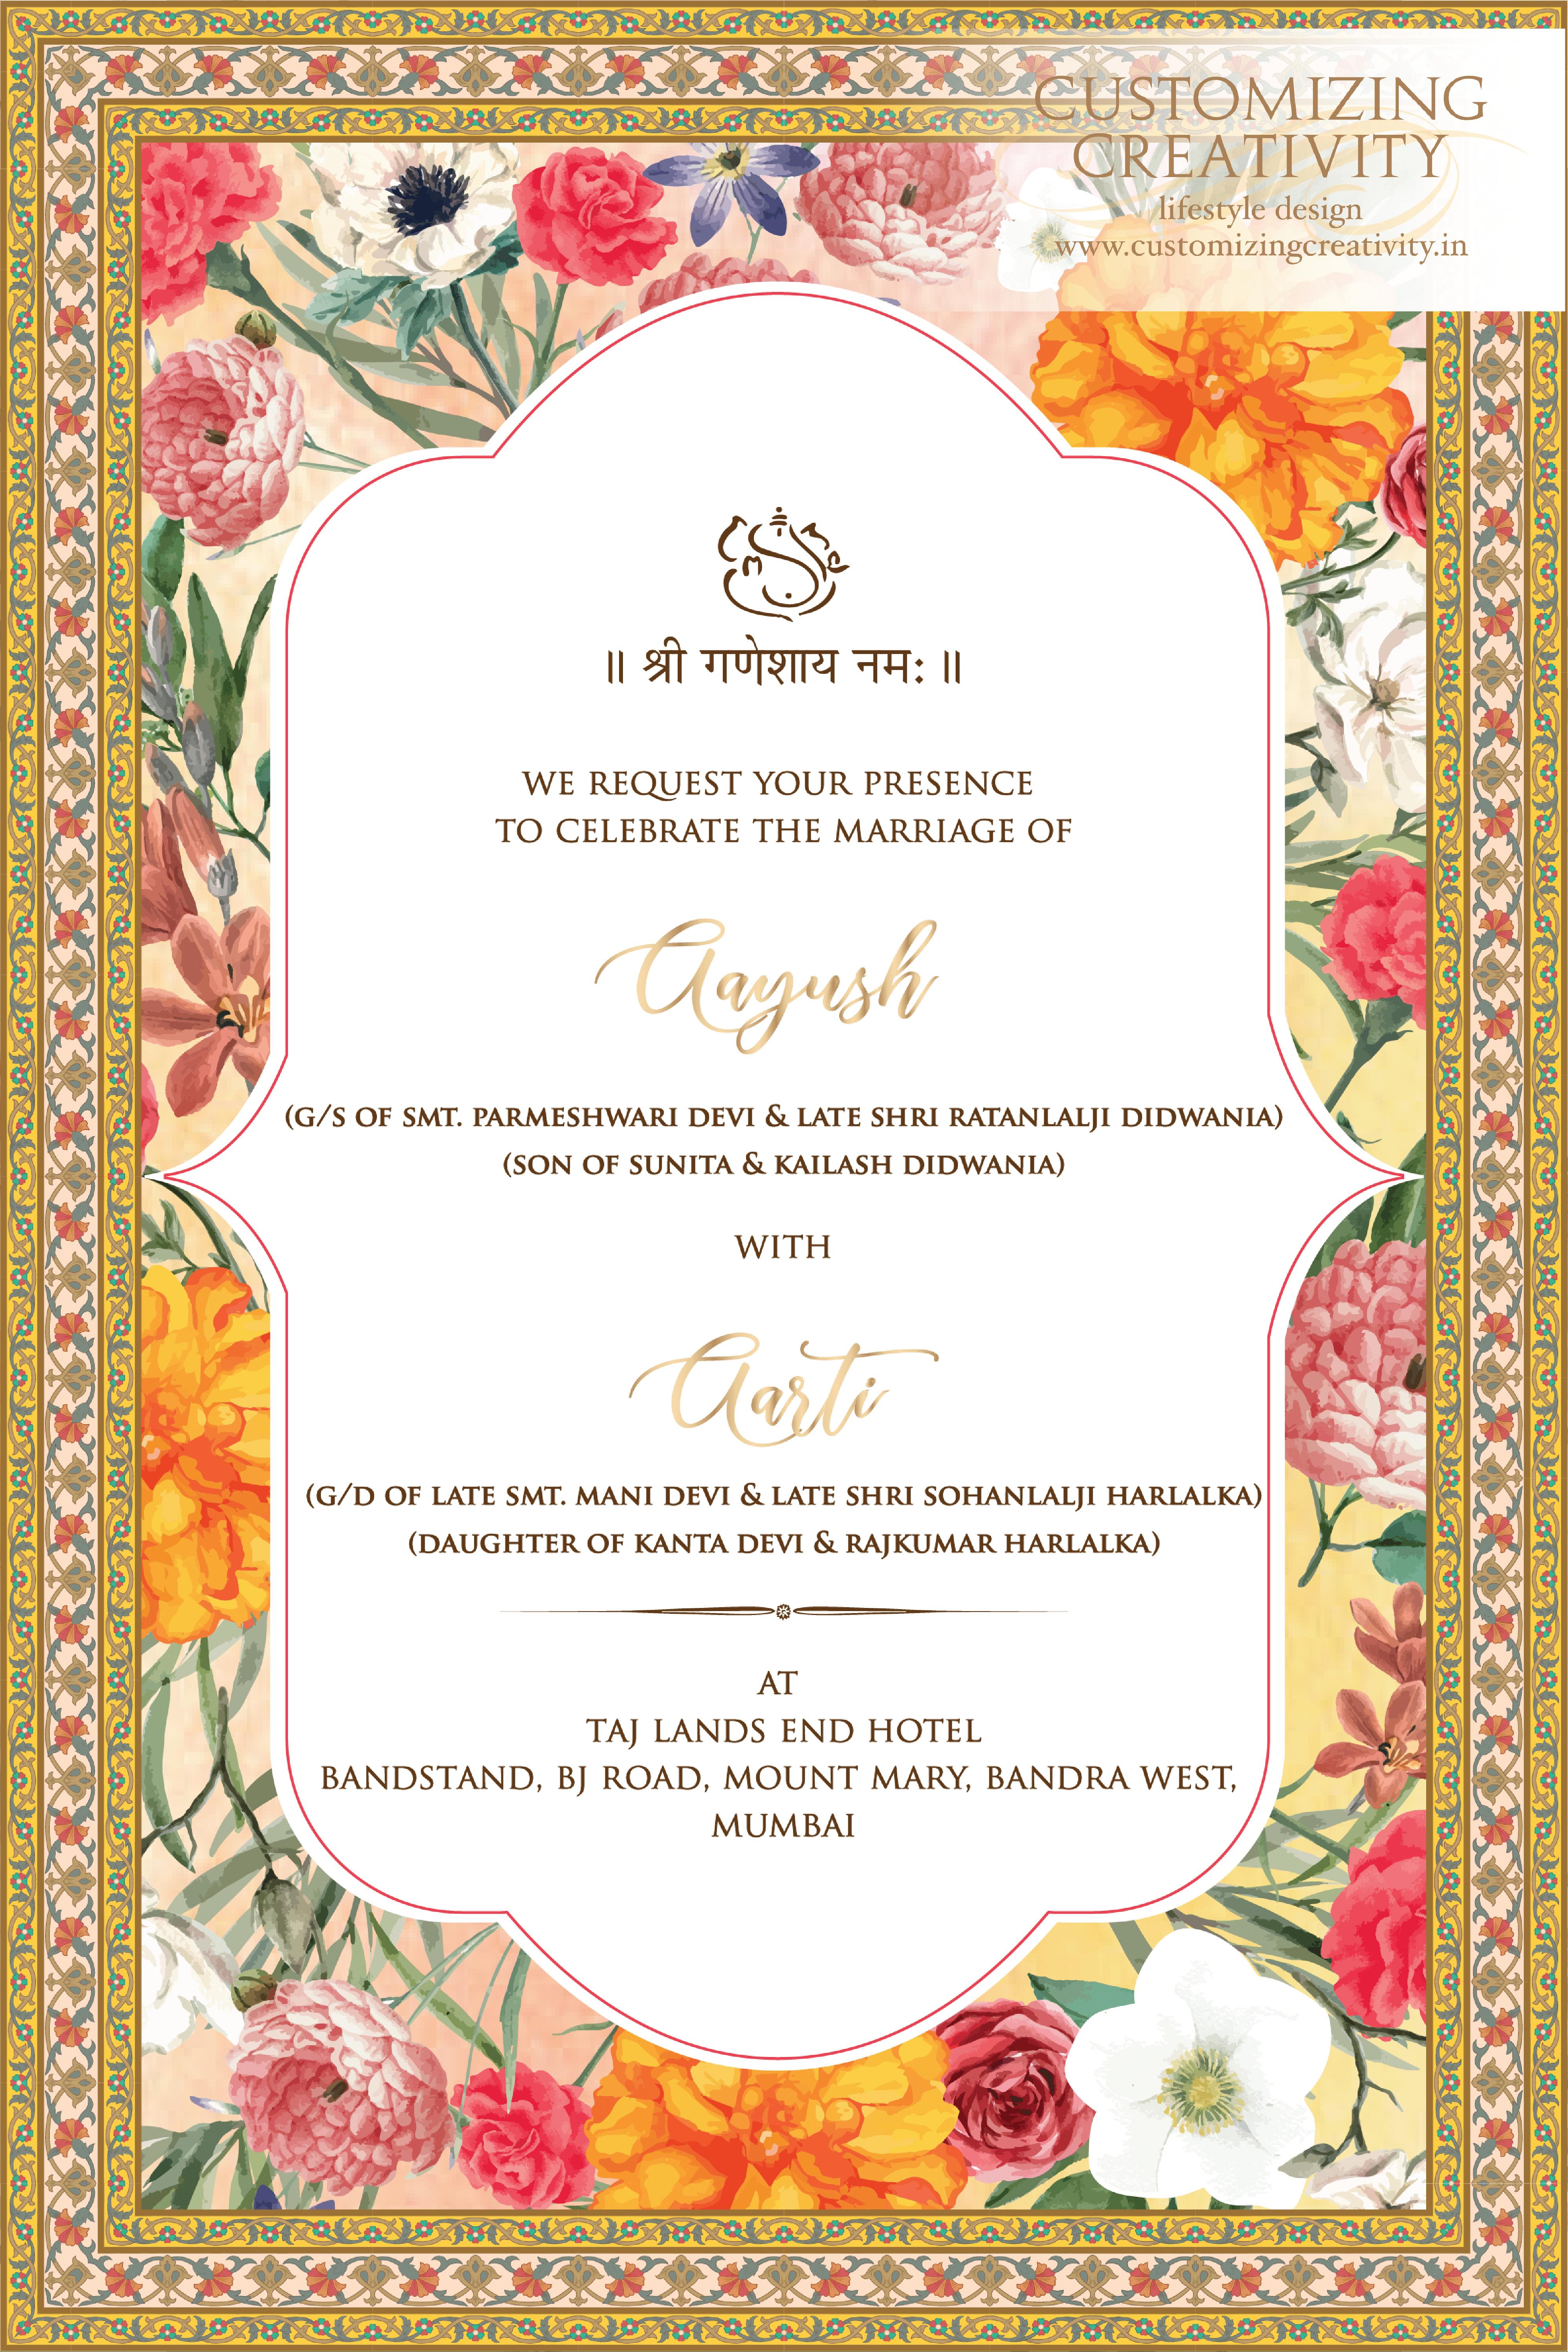 Digital Invites Evite Designs Eversion E Vite E Cards Invites Invitation Cards Wedding I Wedding Invitation Cards Wedding Invitations Wedding Stationery